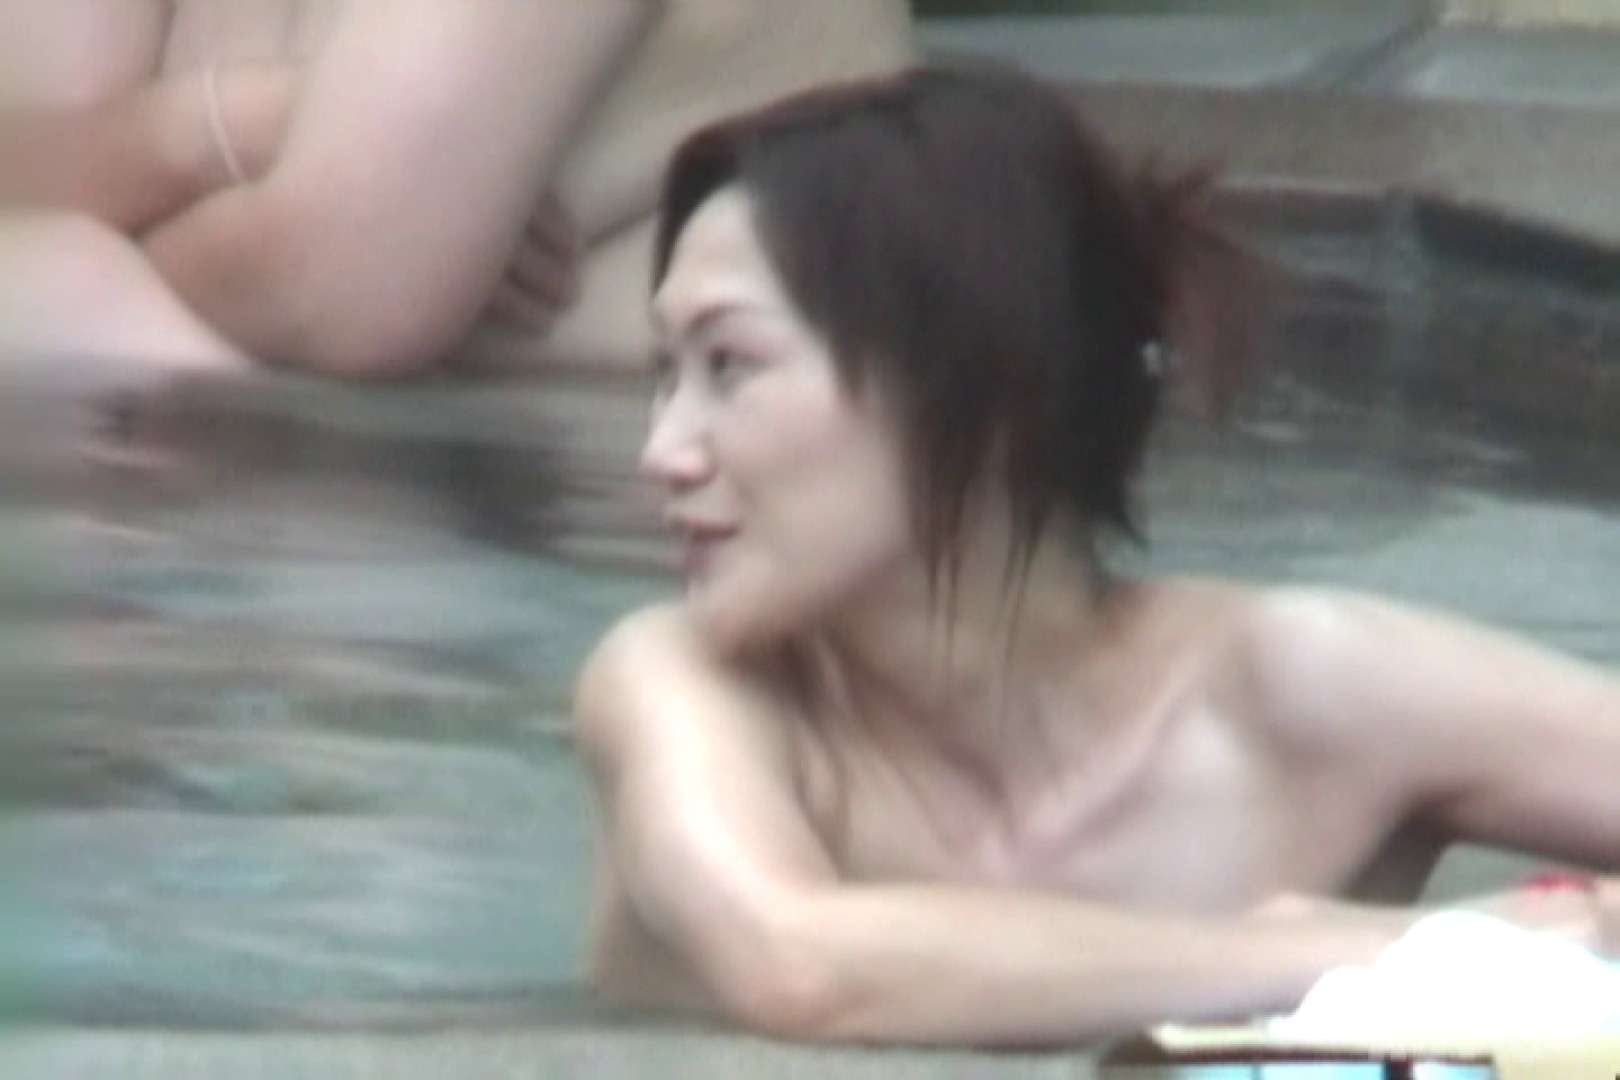 Aquaな露天風呂Vol.739 0 | 0  95連発 71